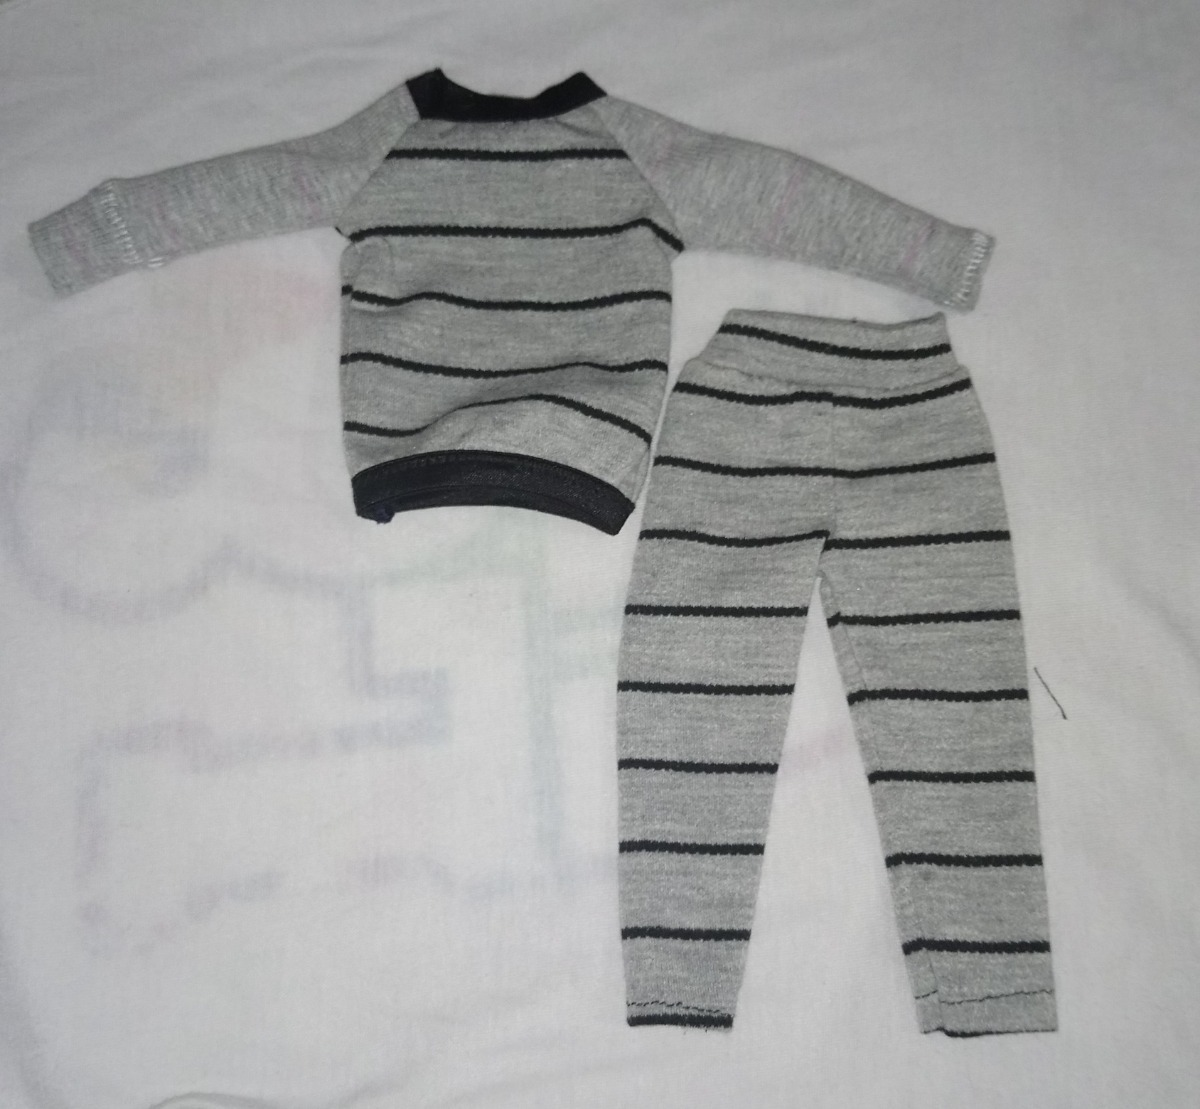 5ed37199c ropa para muñeco ken o similar. Cargando zoom.